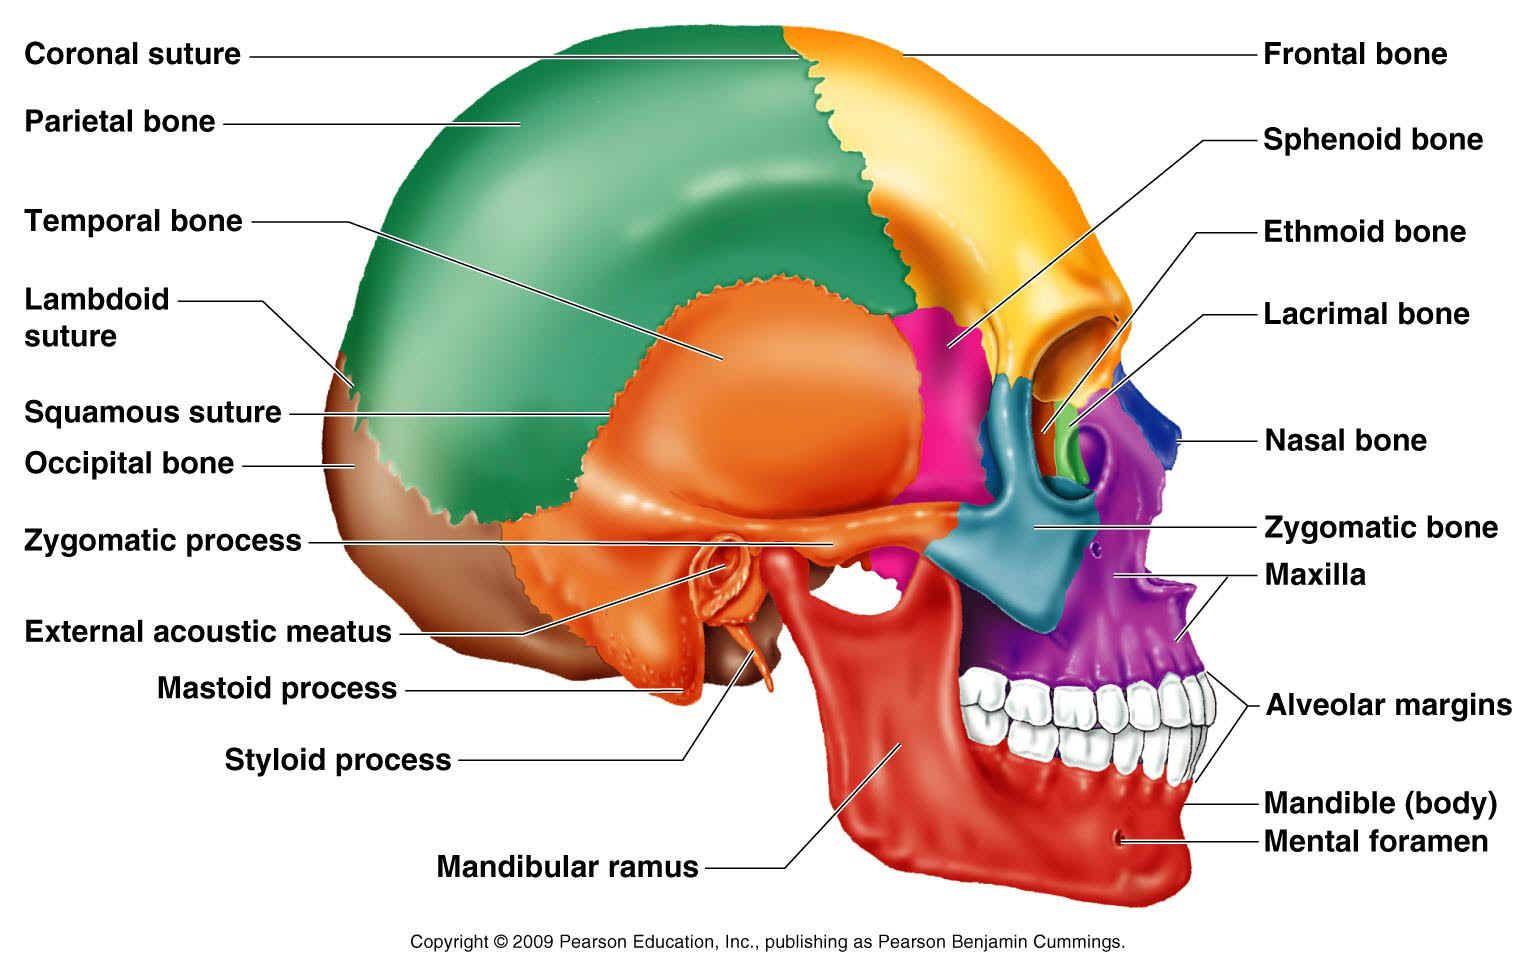 Human Anatomy Pearson Blank Skull Anatomy Of The Skull Bones